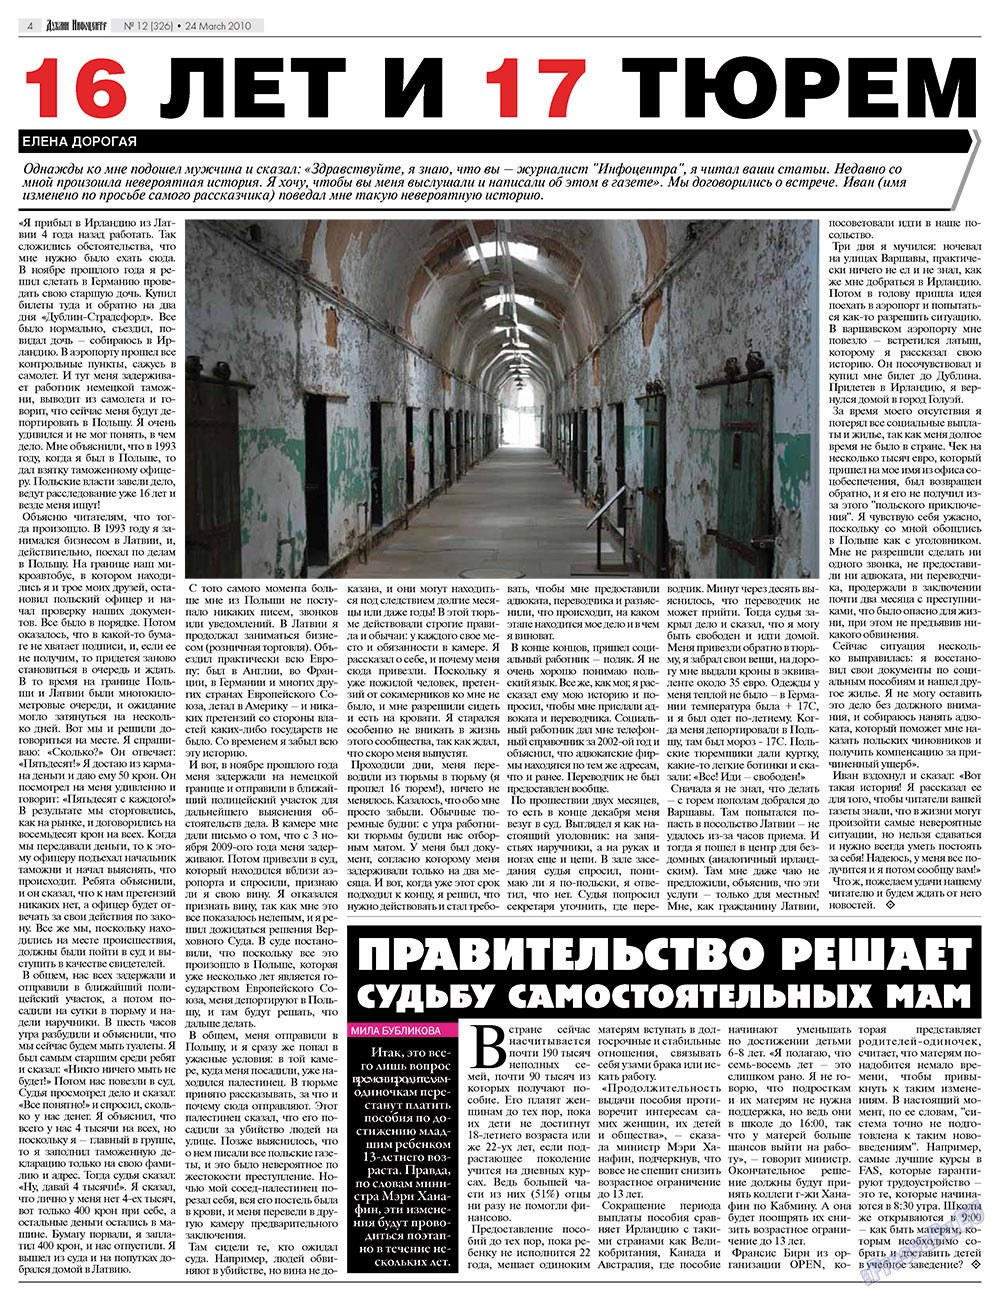 Дублин инфоцентр (газета). 2010 год, номер 12, стр. 4